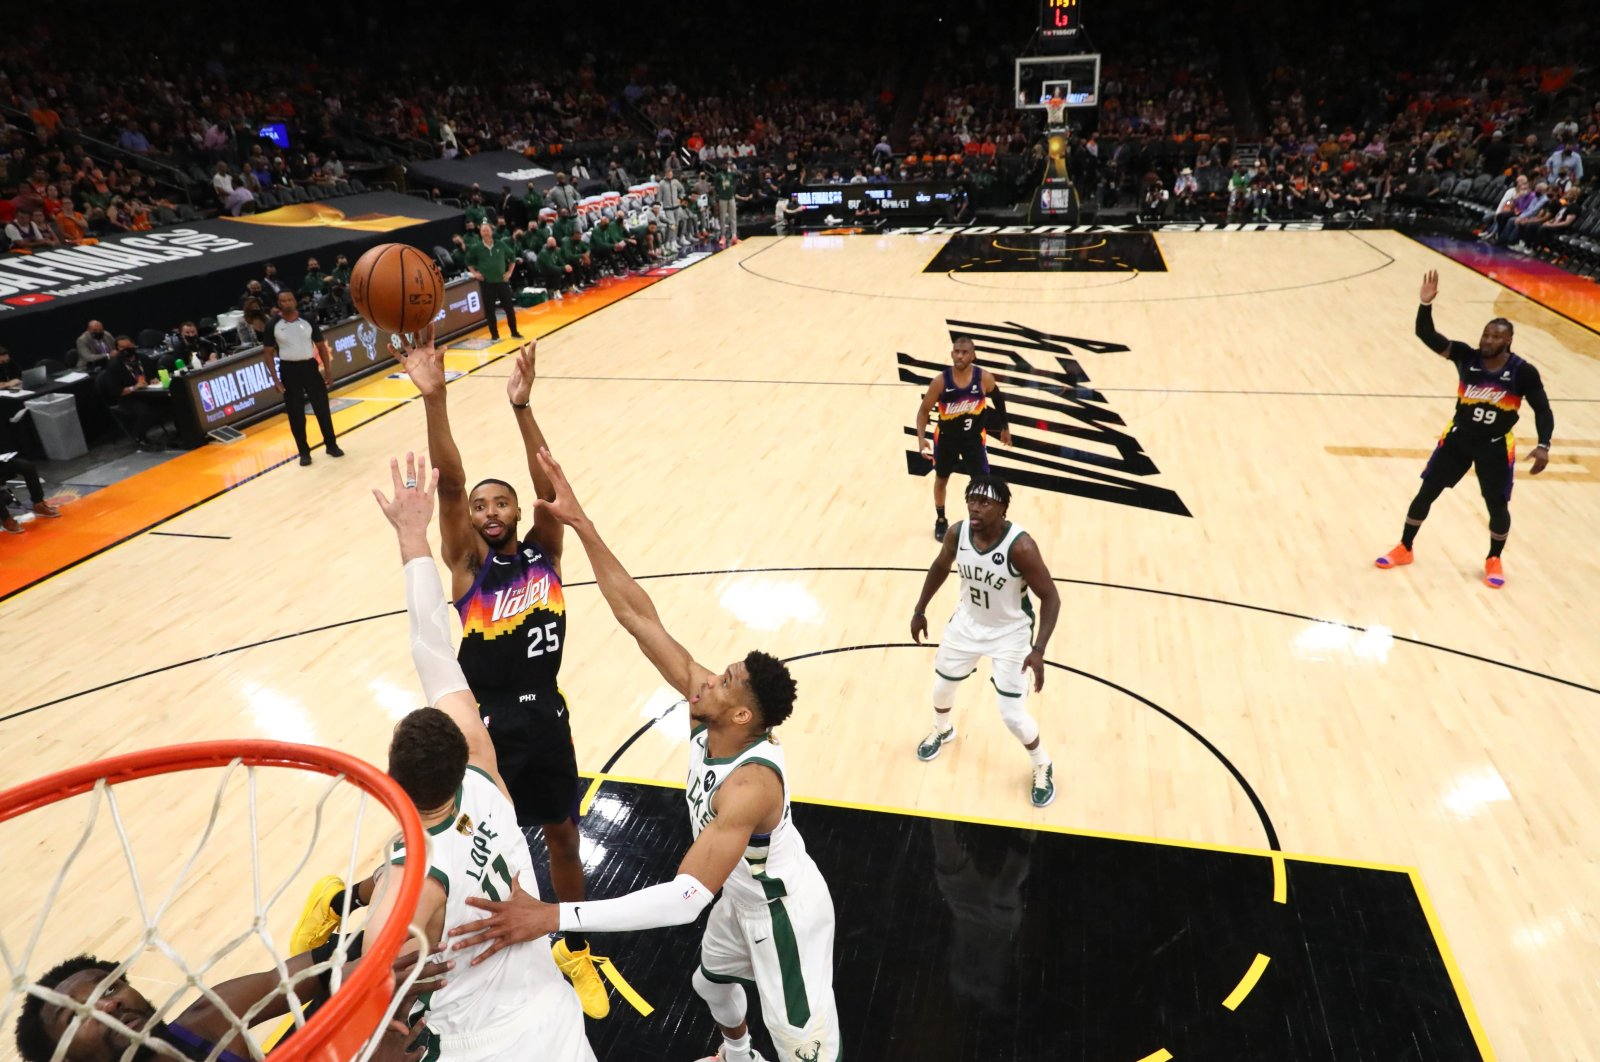 Phoenix Suns forward Mikal Bridges (25) shoots agaisnt Milwaukee Bucks forward Giannis Antetokounmpo (34) in game two of the 2021 NBA Finals at Phoenix Suns Arena, in Phoenix, U.S., July 8, 2021. (Reuters Photo)